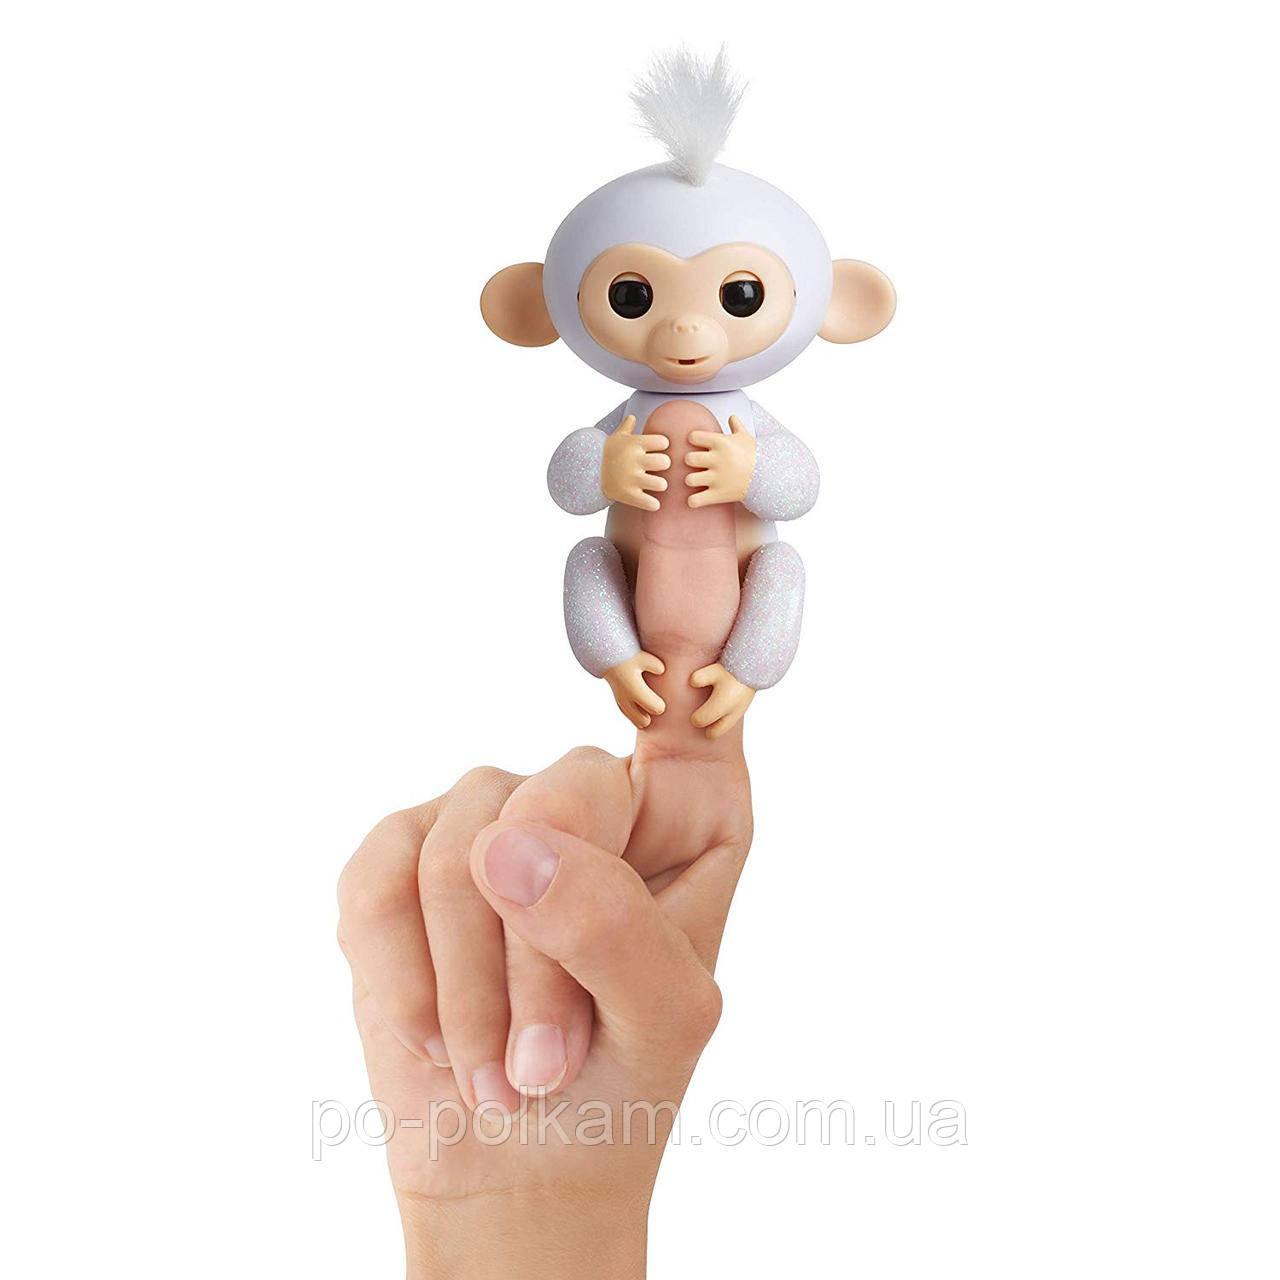 Интерактивная обезьянка WowWee Baby Pet - Sugar (White Glitter), оригинал, фото 1